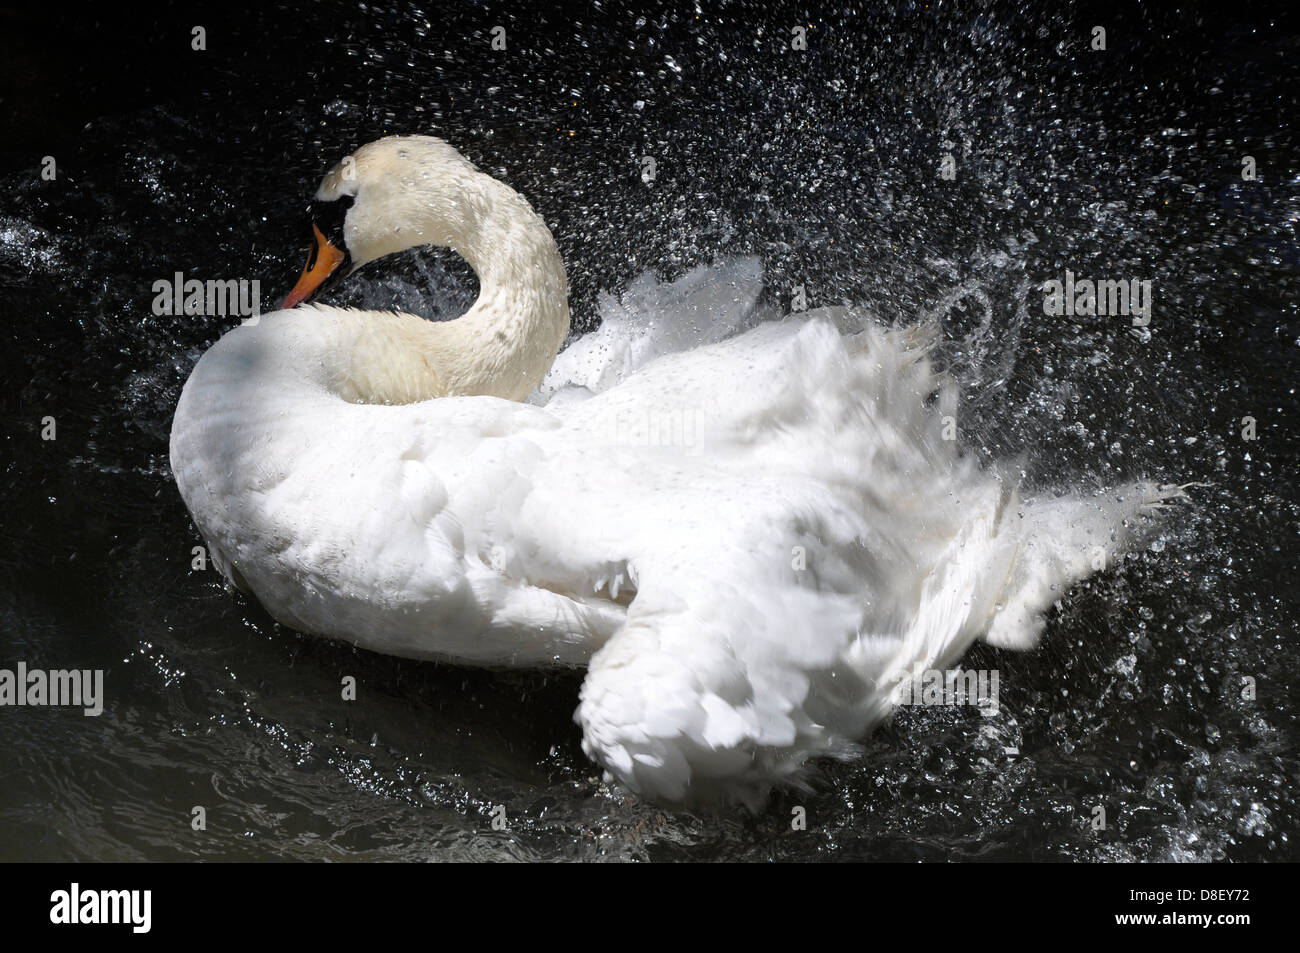 Limpieza de aleteo de cisne (Cygnus olor), Abbotsbury Swannery, Dorset Imagen De Stock